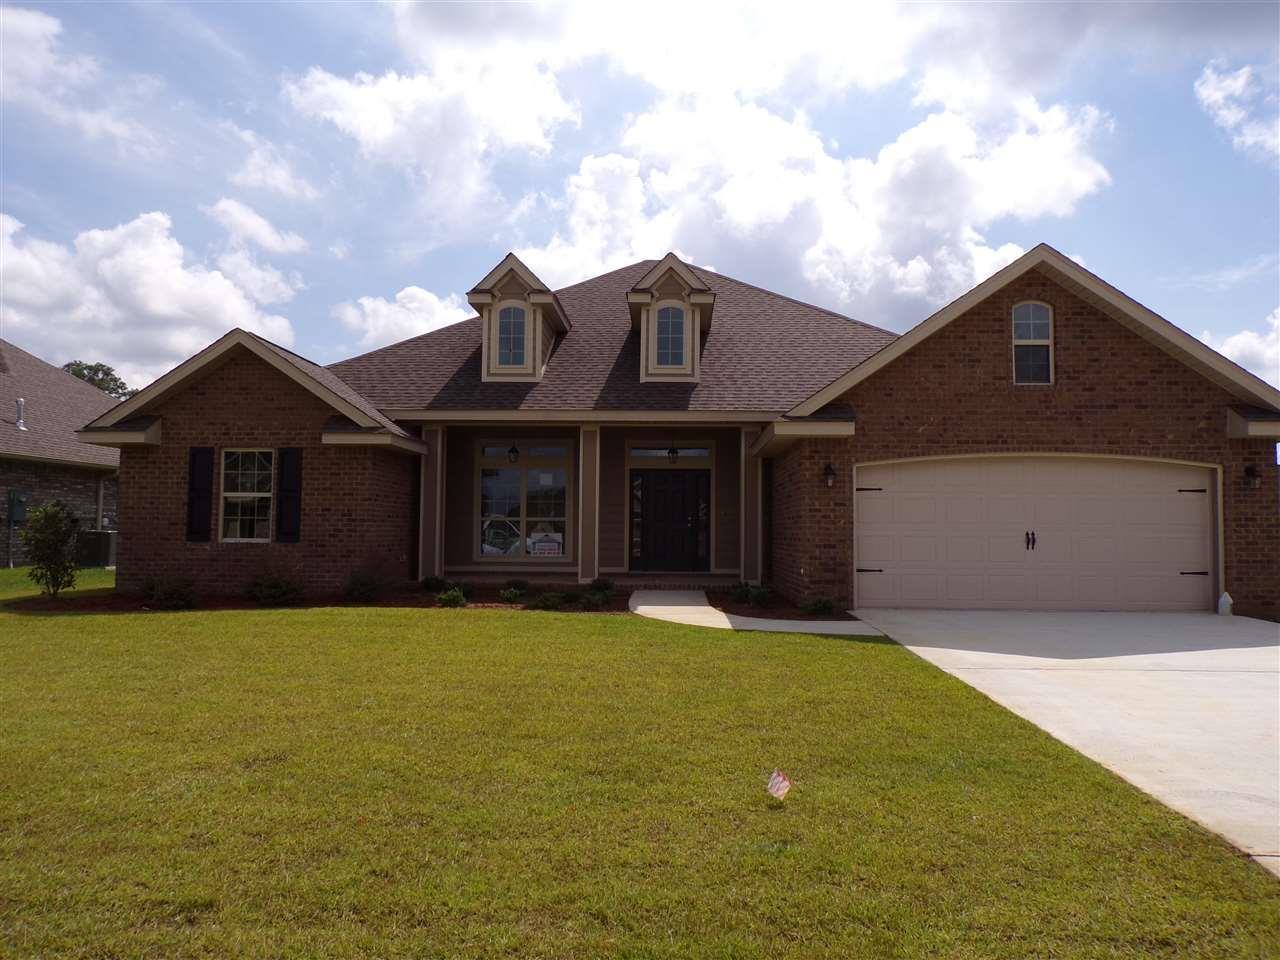 7762 Winter Greene Dr, Pensacola, FL 32526